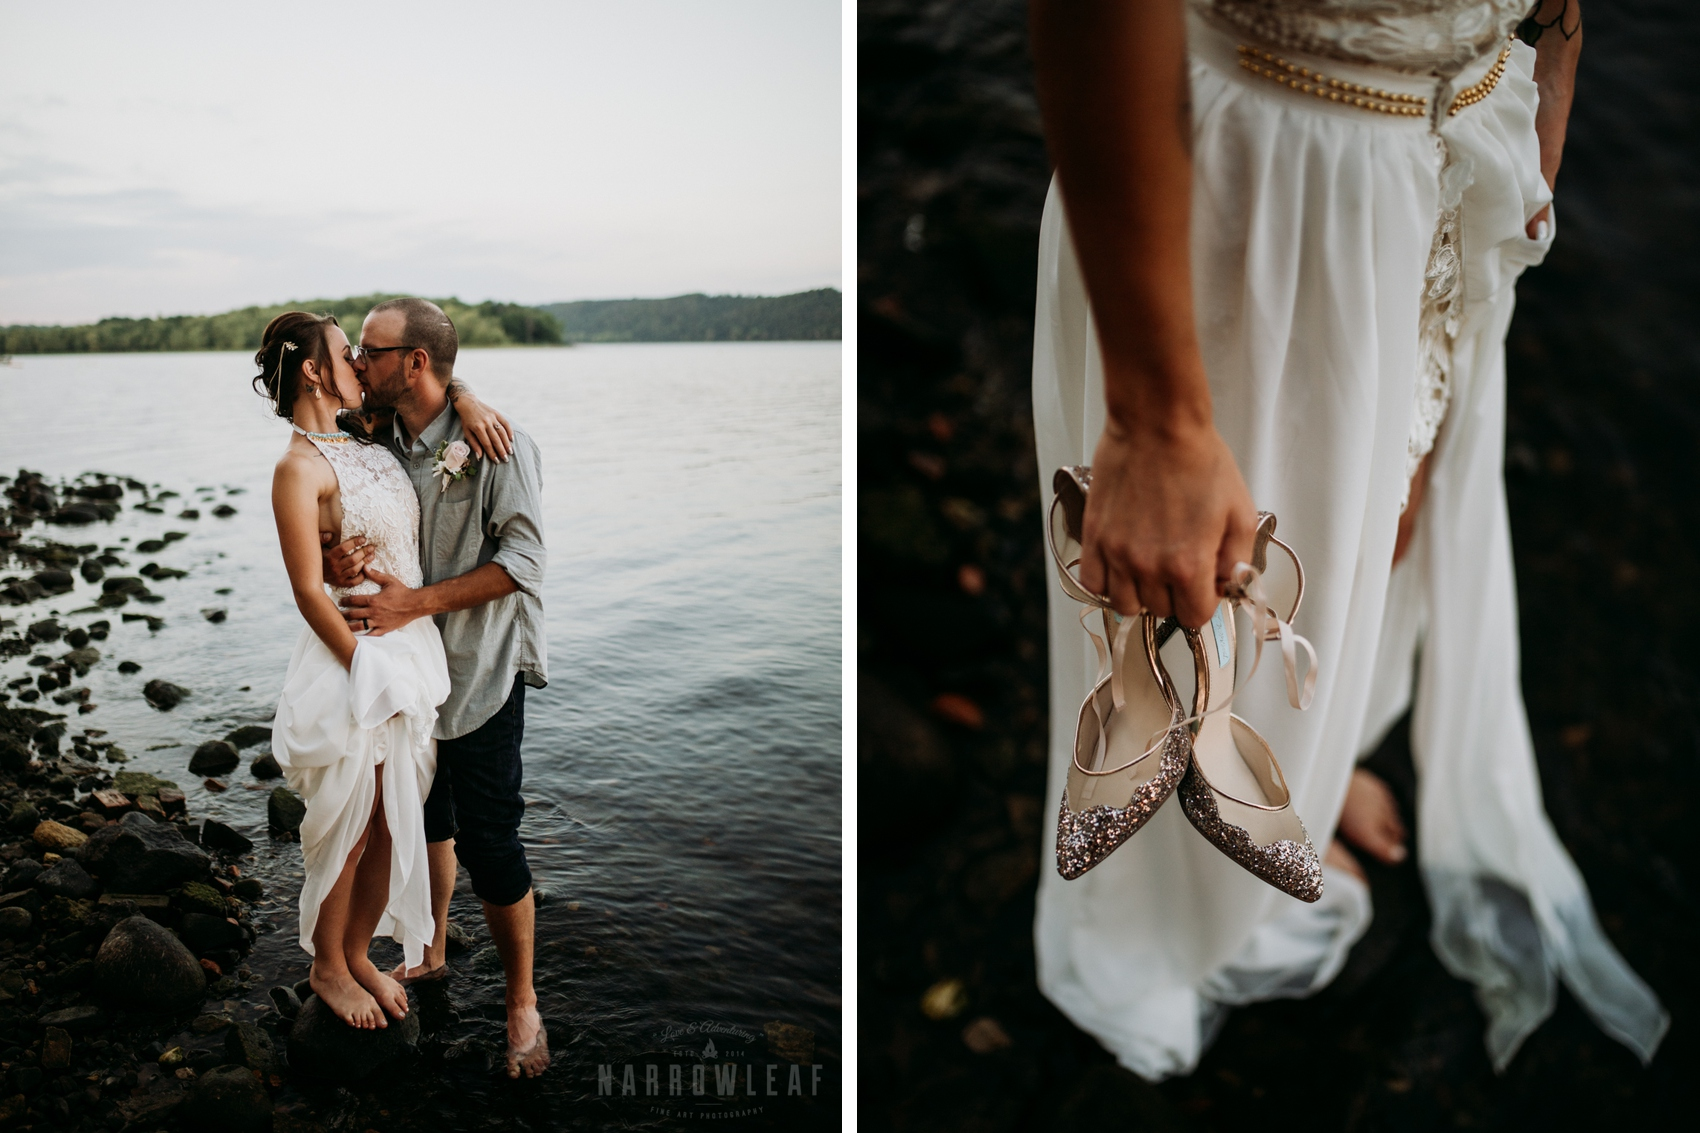 moody-mn-river-outdoor-elopement-bride-narrowLeaf-photography.jpg